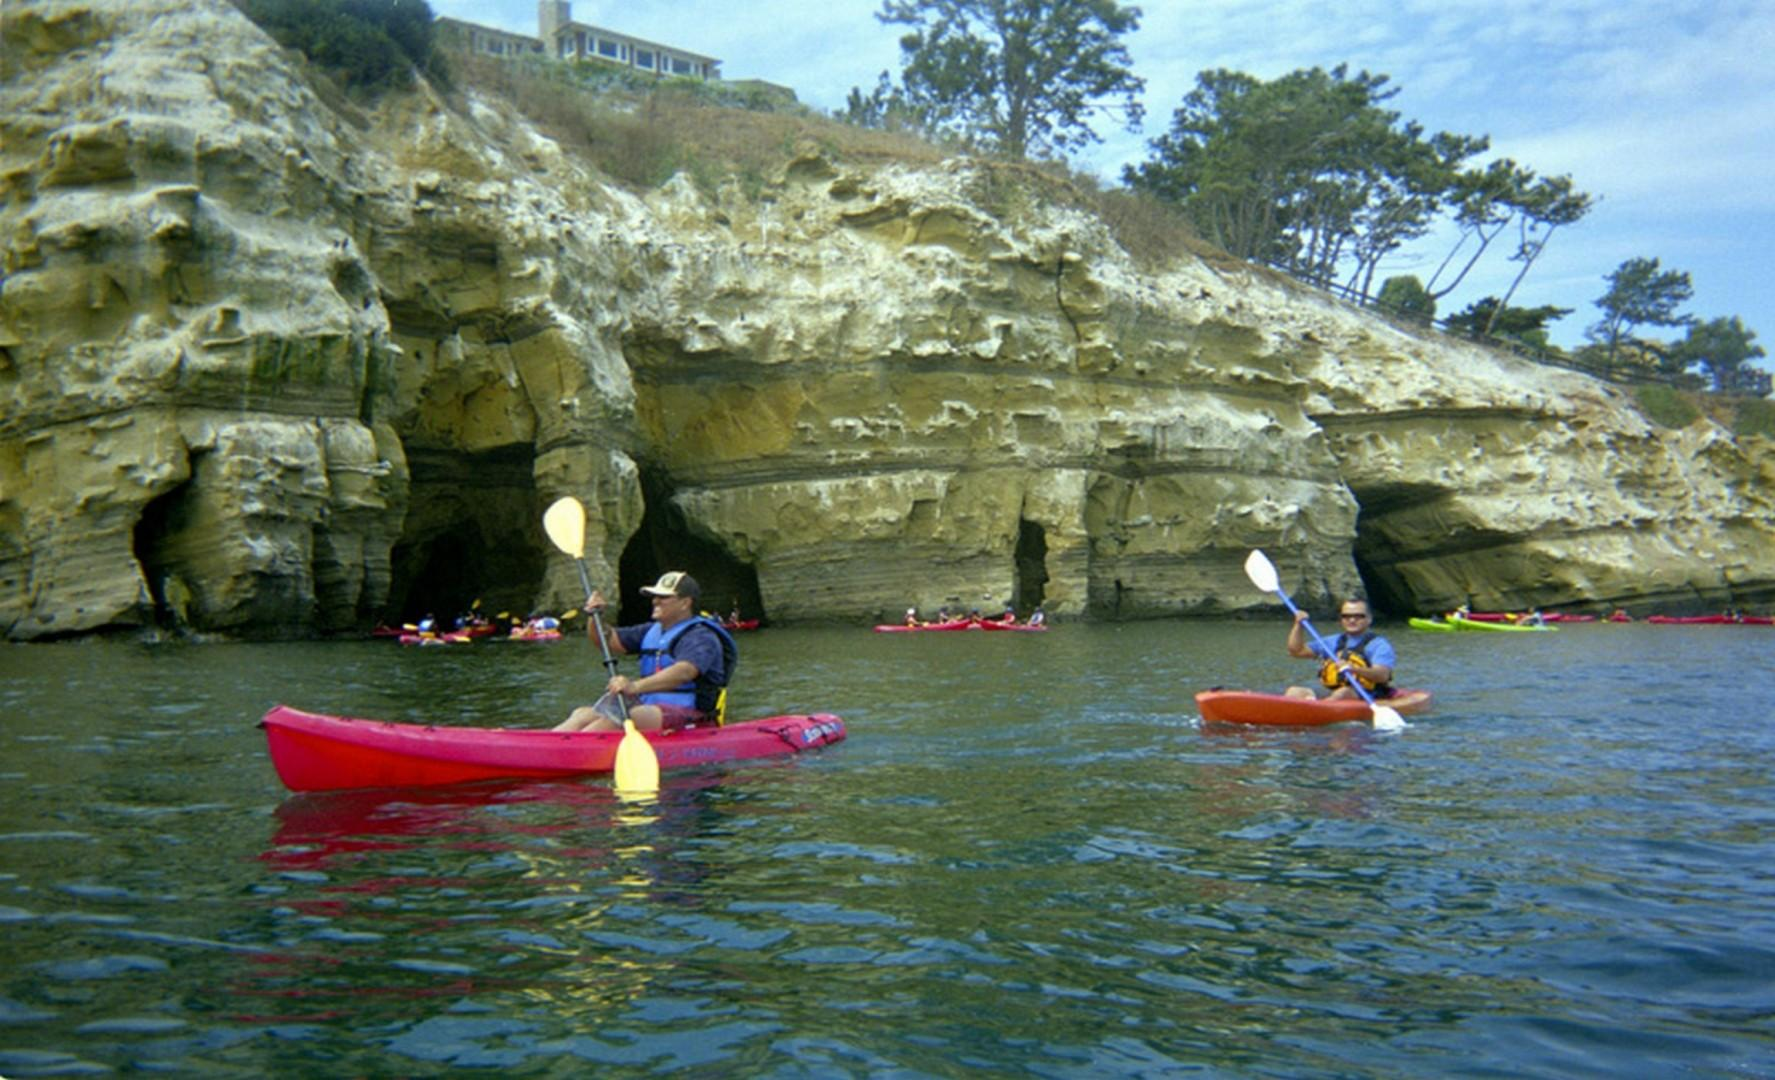 Explore nearby caves at the La Jolla Cove